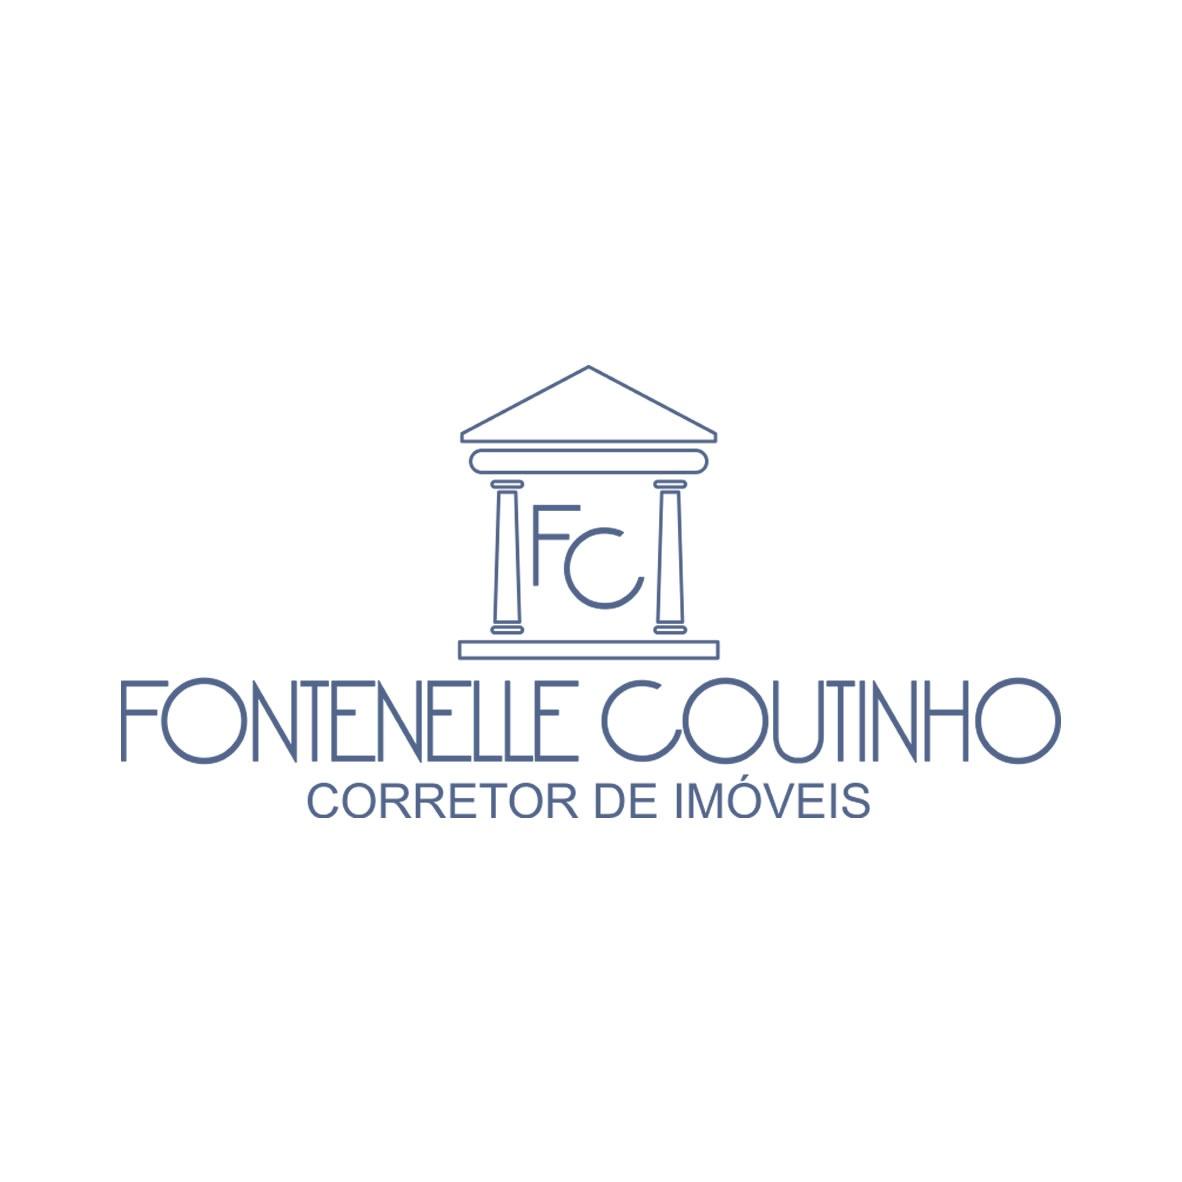 logomarca_fontenelle_coutinho